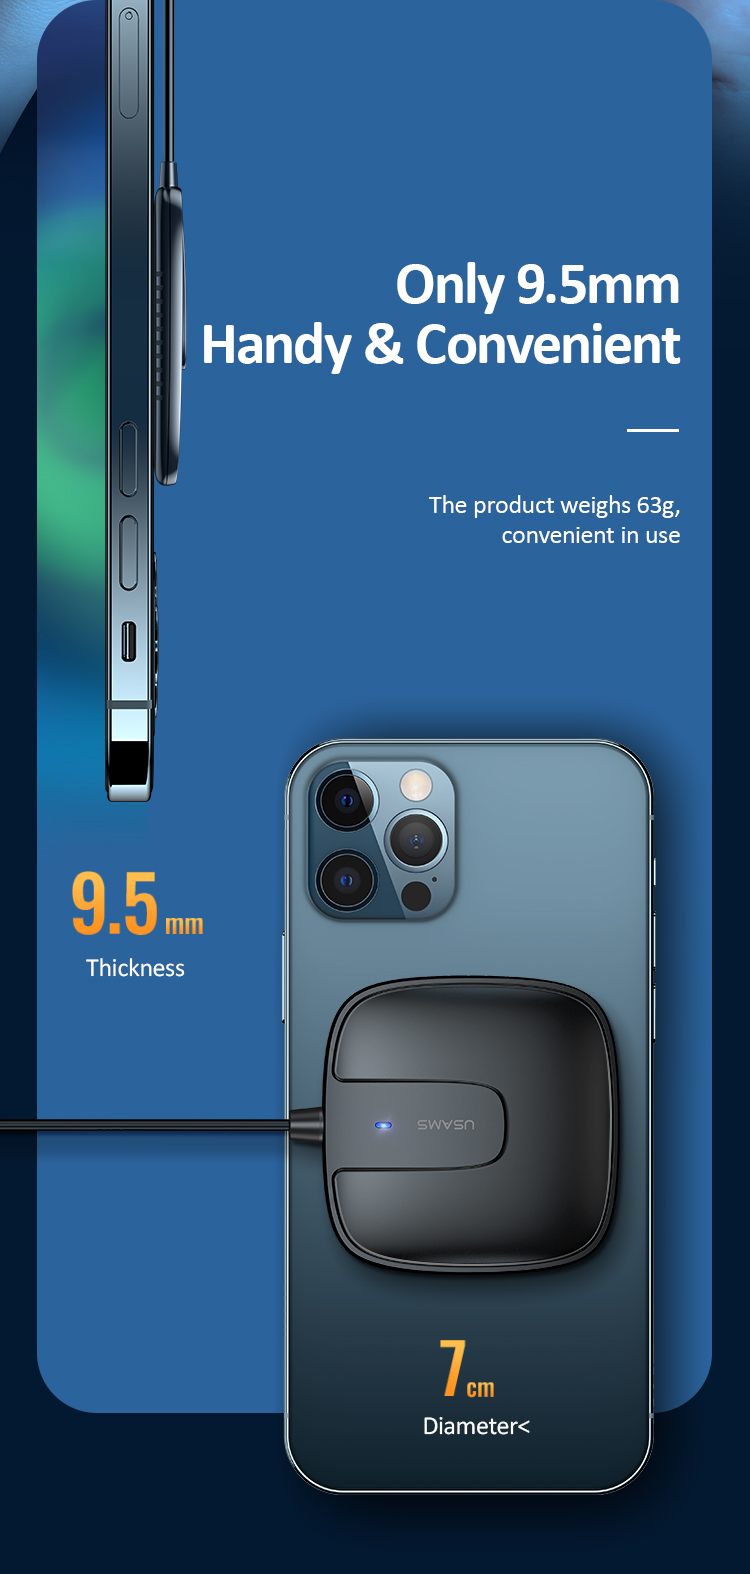 W1-苹果超薄磁吸无线快充充电器带线款-US-CD159_06